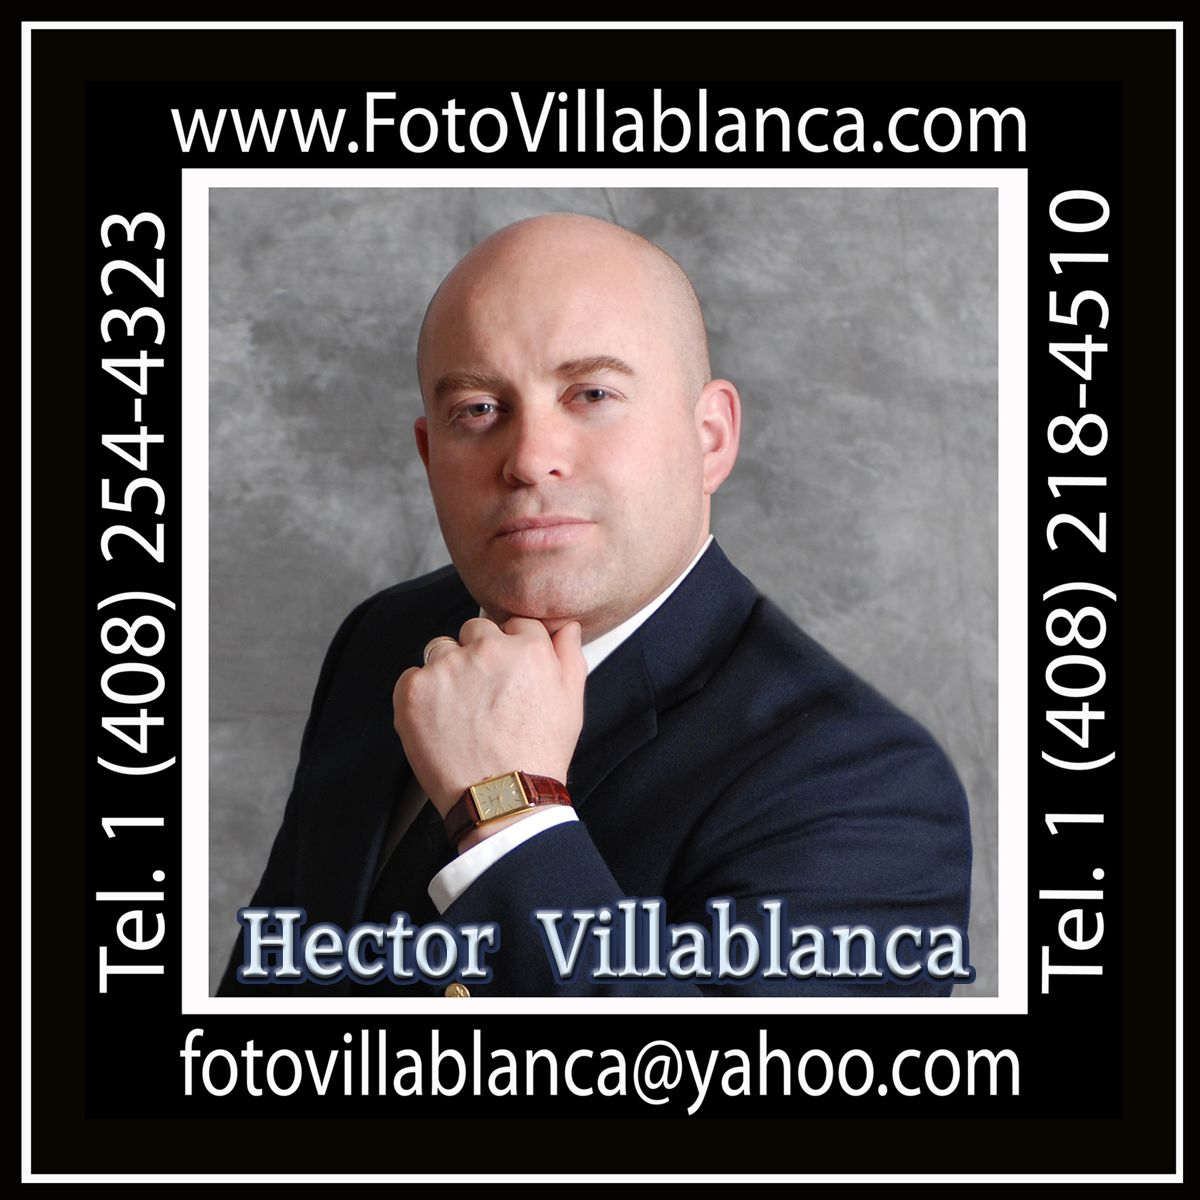 Villablanca Photo Video Studio in San Jose, California 1 (408) 218-4510 (Texts & Messages) www.FotoVillablanca.com Contact : Hector Villablanca  >> fotovillablanca@yahoo.com